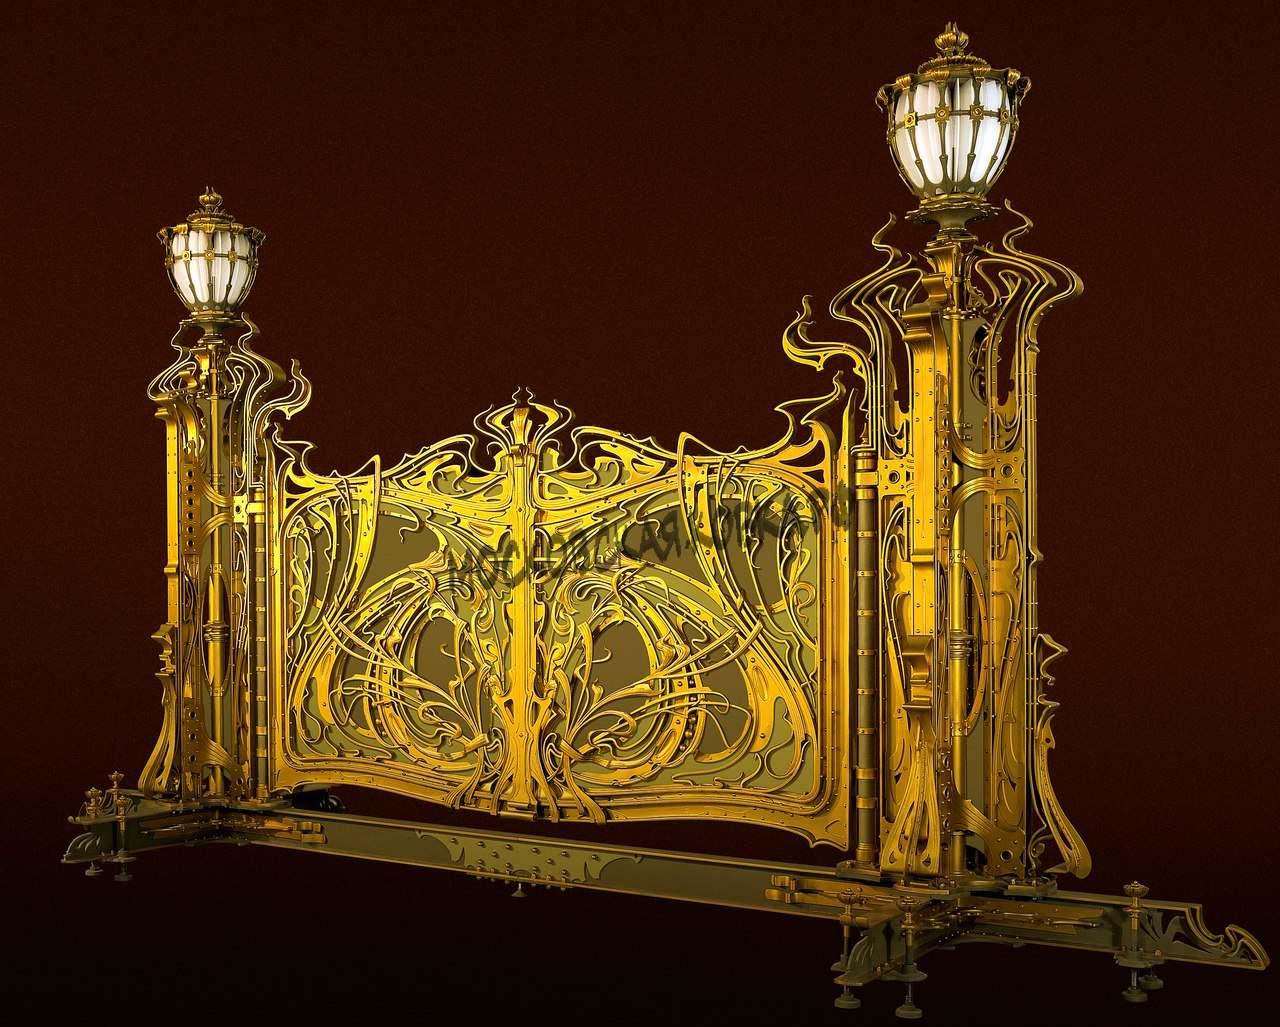 Дизайн проект кованых ворот со столбами Артикул КВ-063